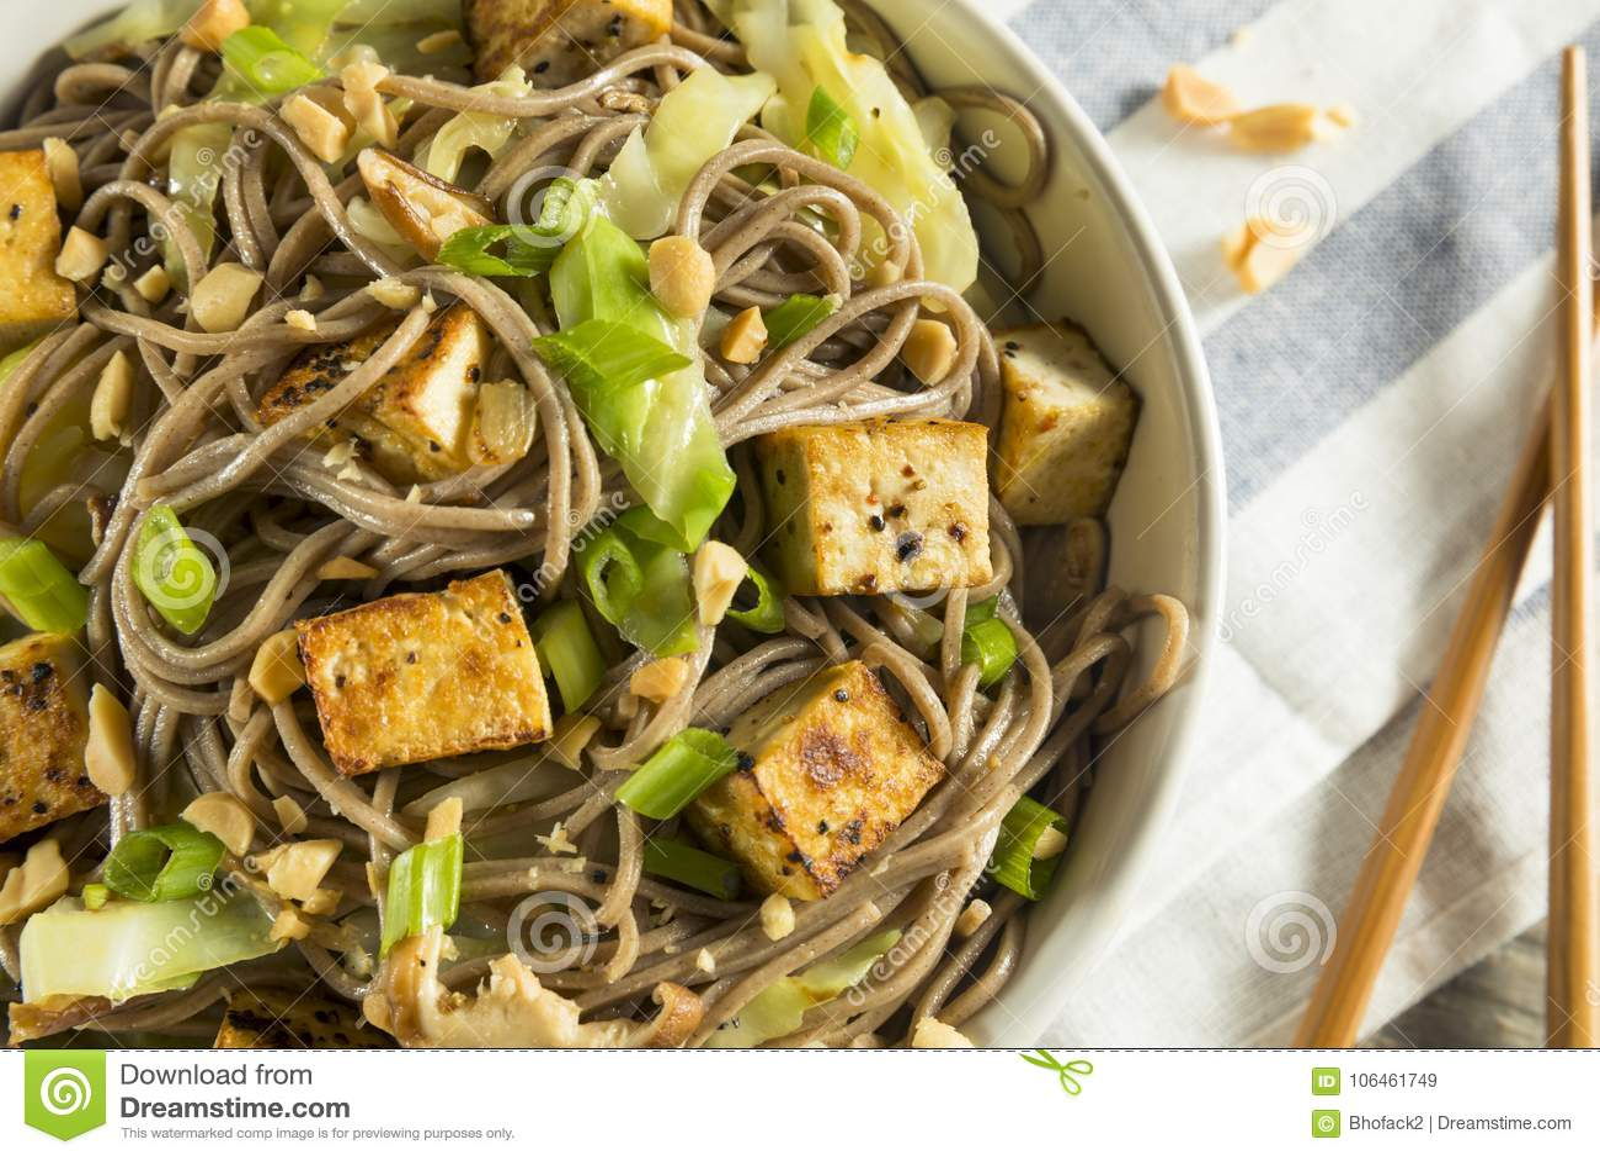 Apologise, asian peanut sauce beansprouts tofu Bravo, this